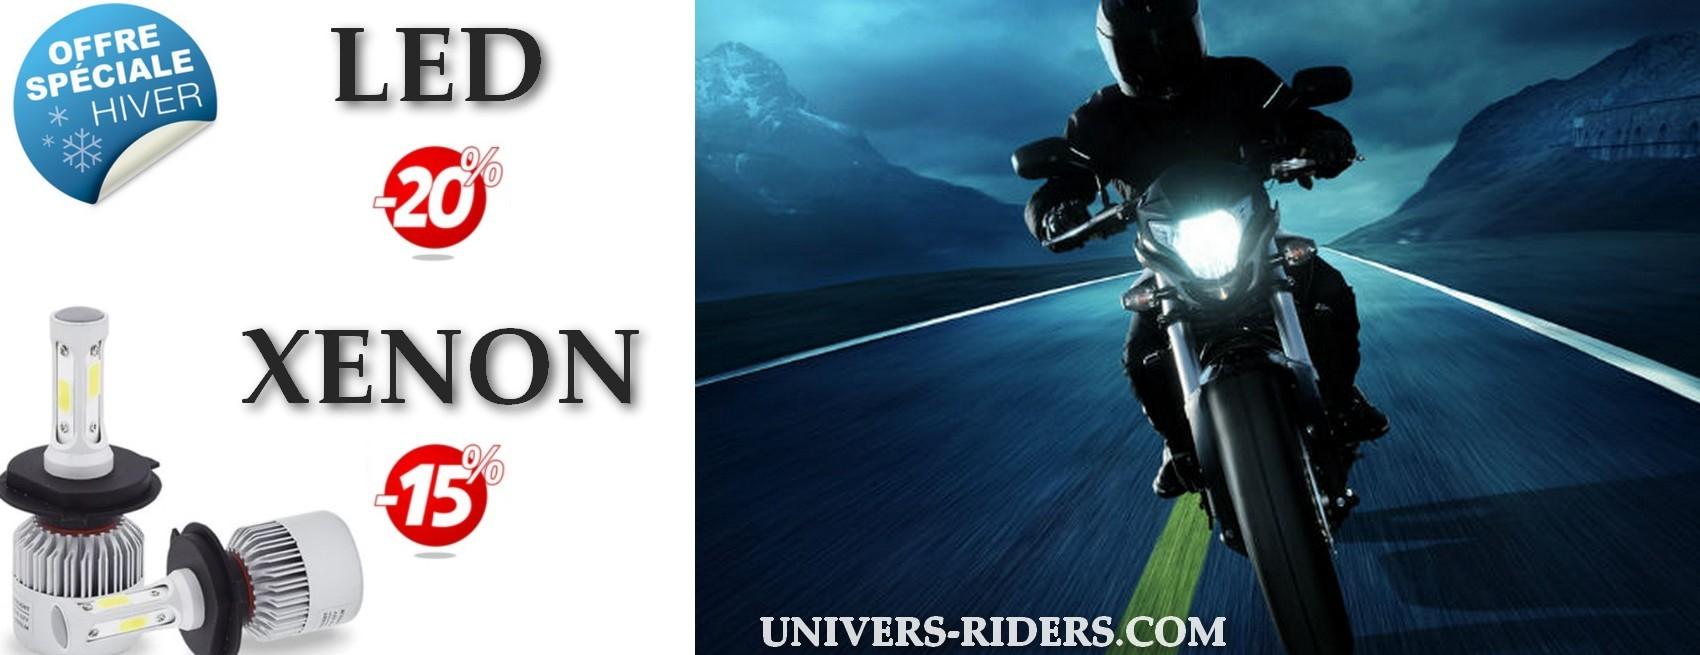 Promotions hiver xénon et led moto